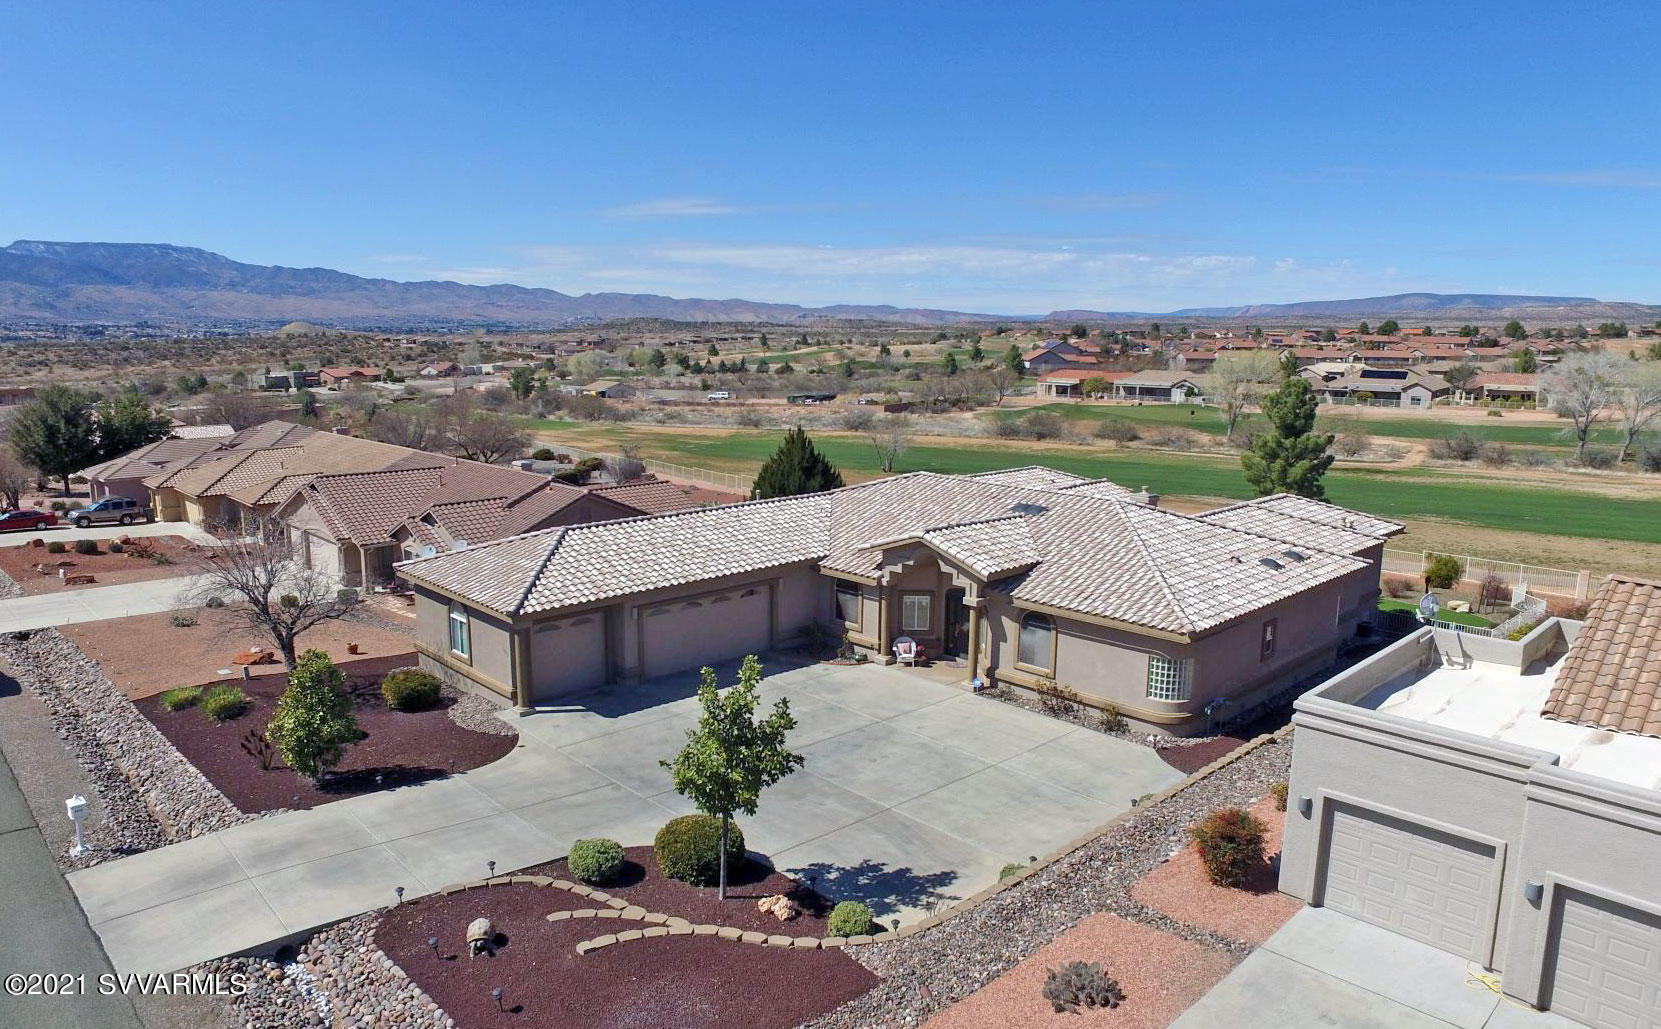 1075 Verde Santa Fe Pkwy Cornville, AZ 86325